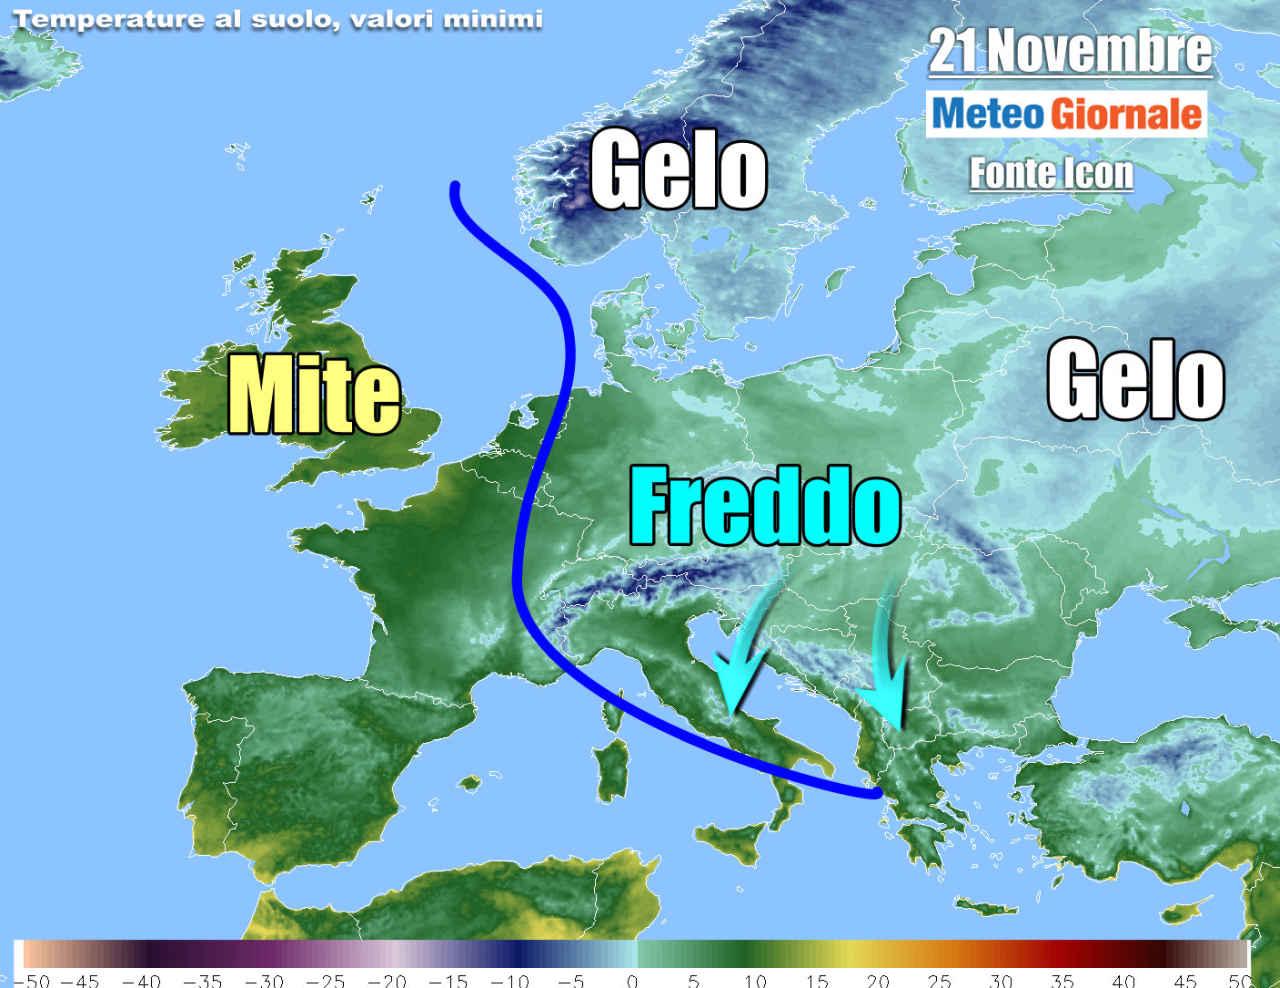 freddo weekend - METEO, primo FREDDO invernale è in arrivo. Temperature in picchiata